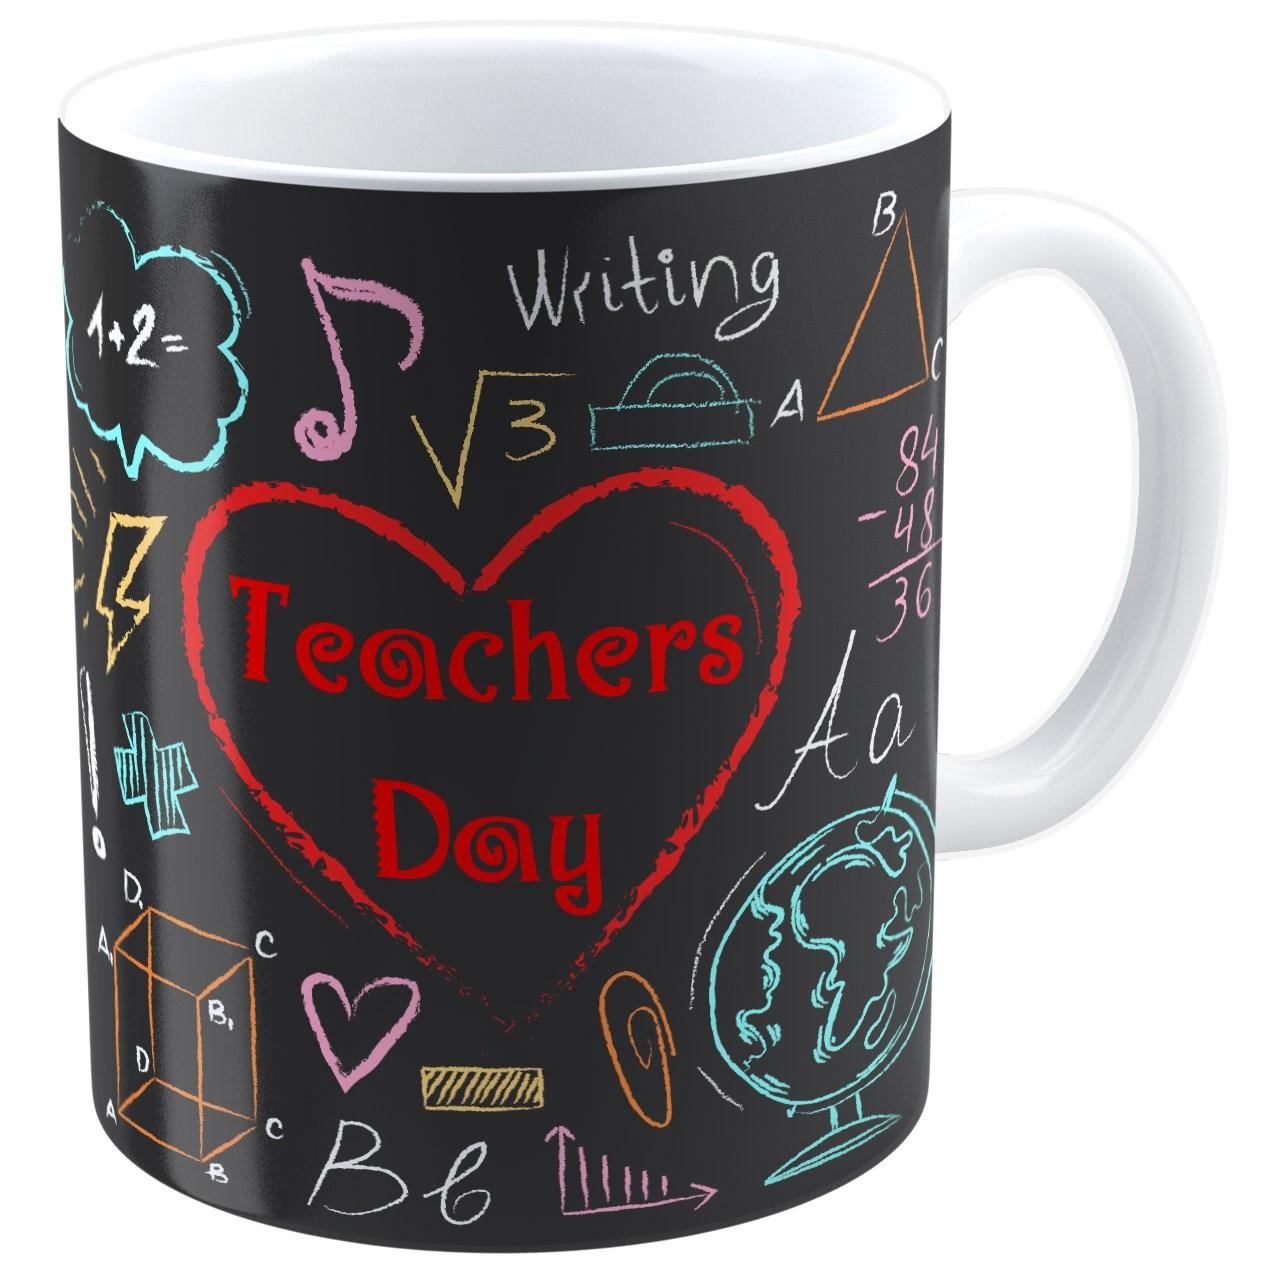 عکس ماگ شین دیزاین طرح  تخته گچی روز معلم کد 4159